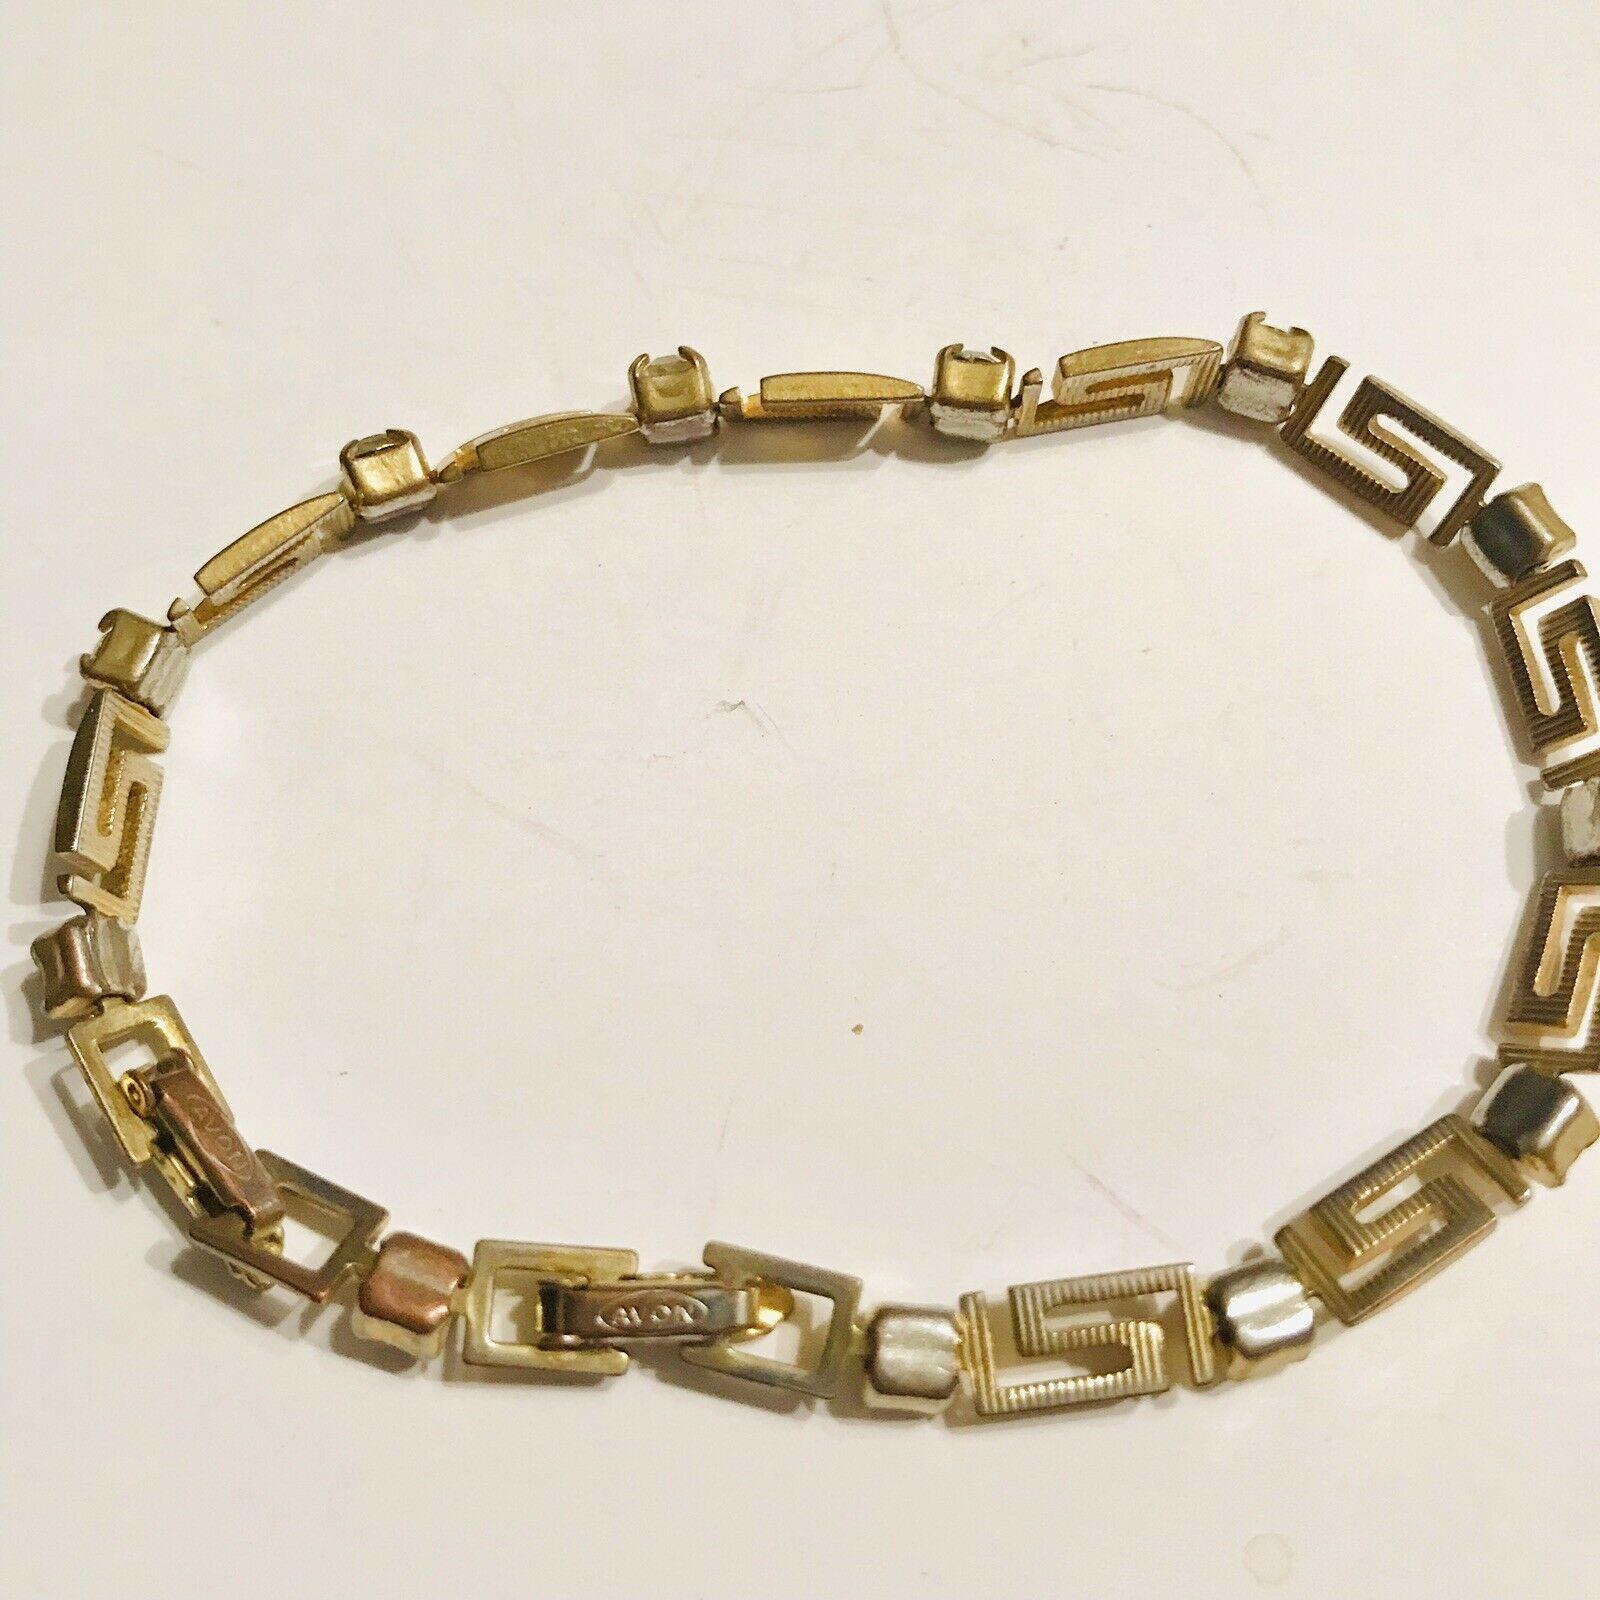 Vintage Avon Tennis Bracelet Gold Tone & CZ Scroll Work Design J0691 image 3